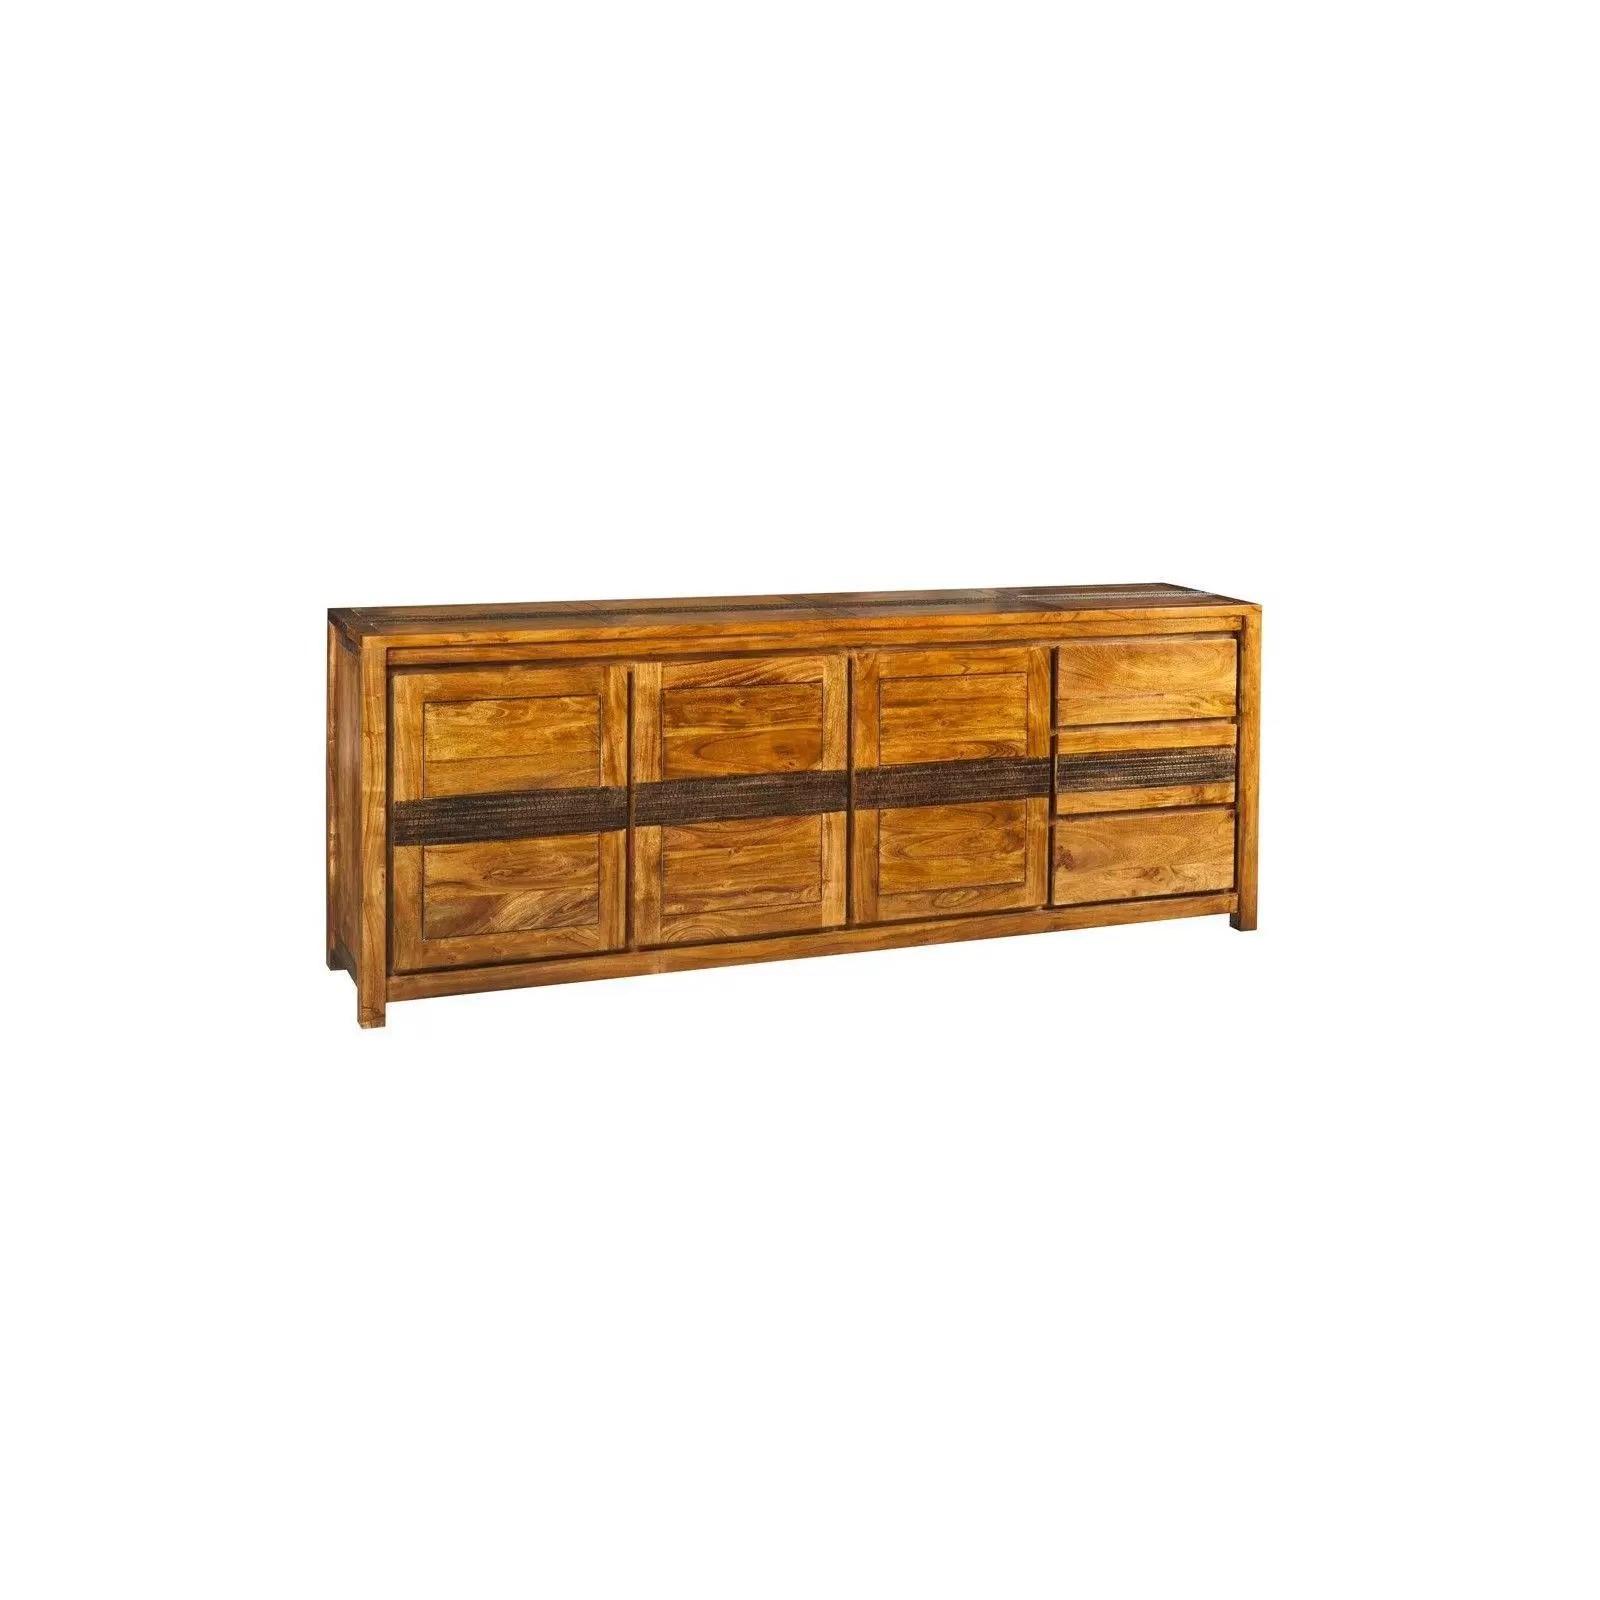 buffet bahut tatoo haut de gamme en bois d acacia massif 3 portes et 3 tiroirs